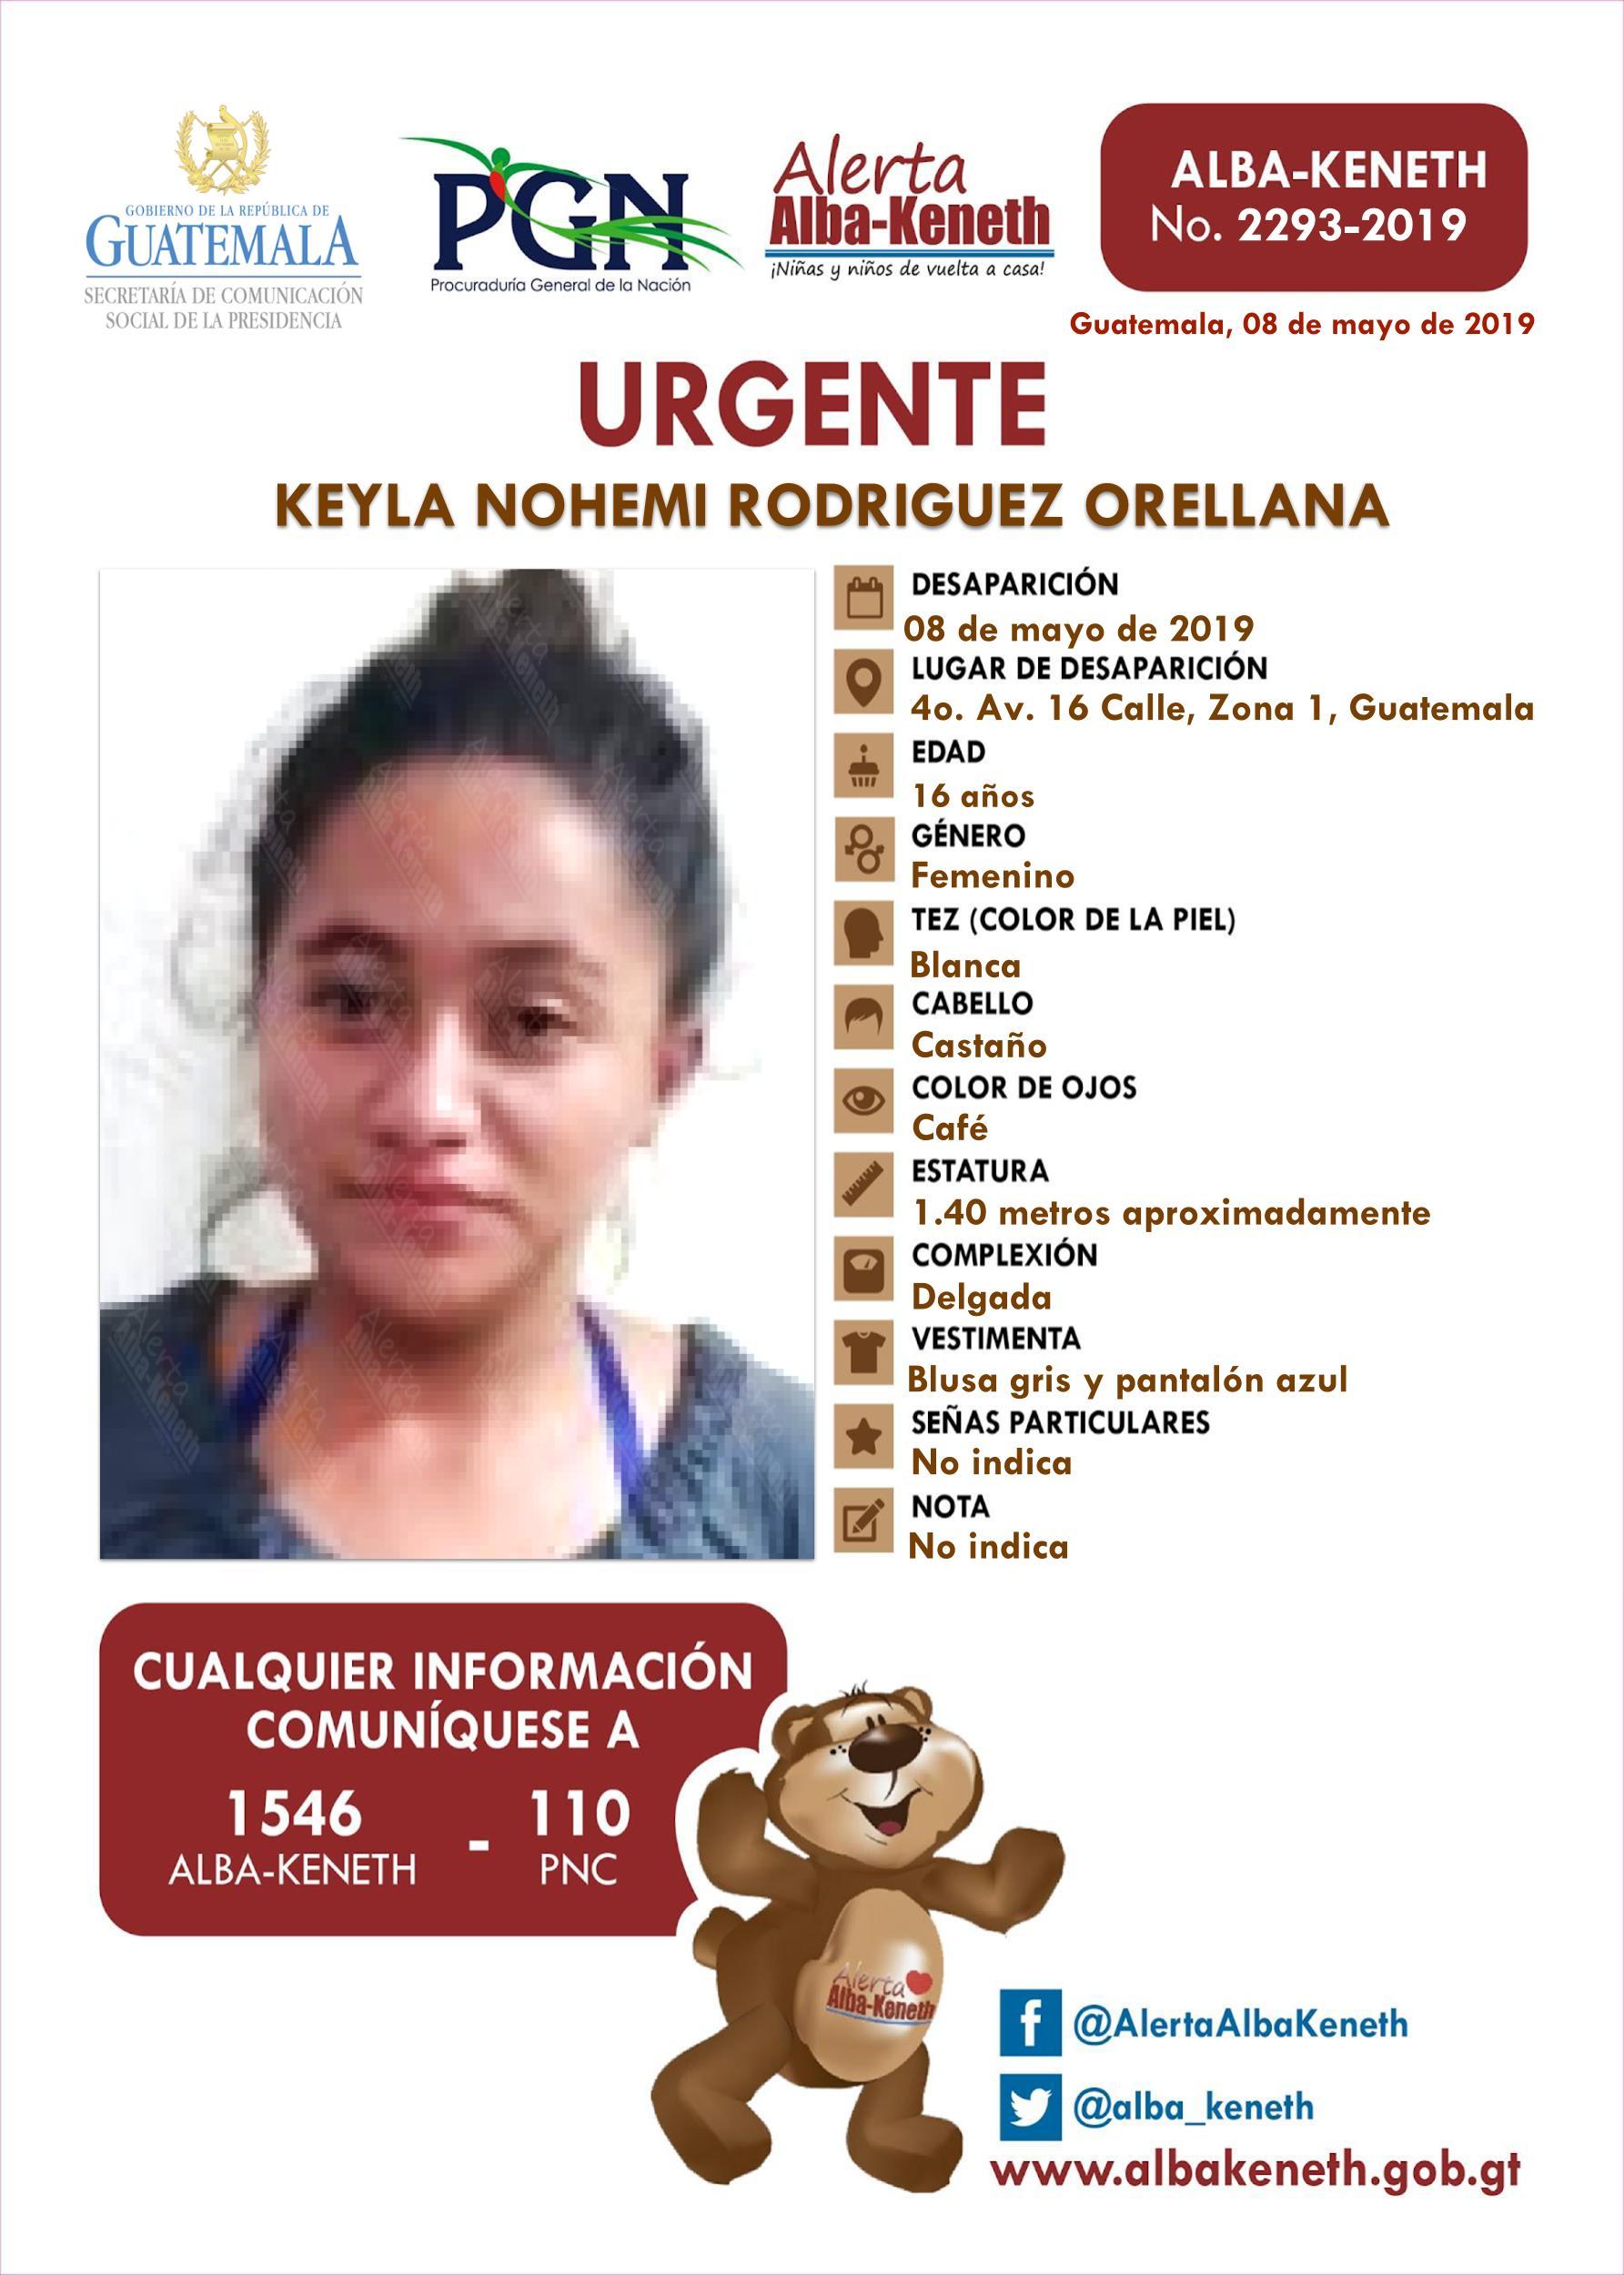 Keyla Nohemi Rodriguez Orellana